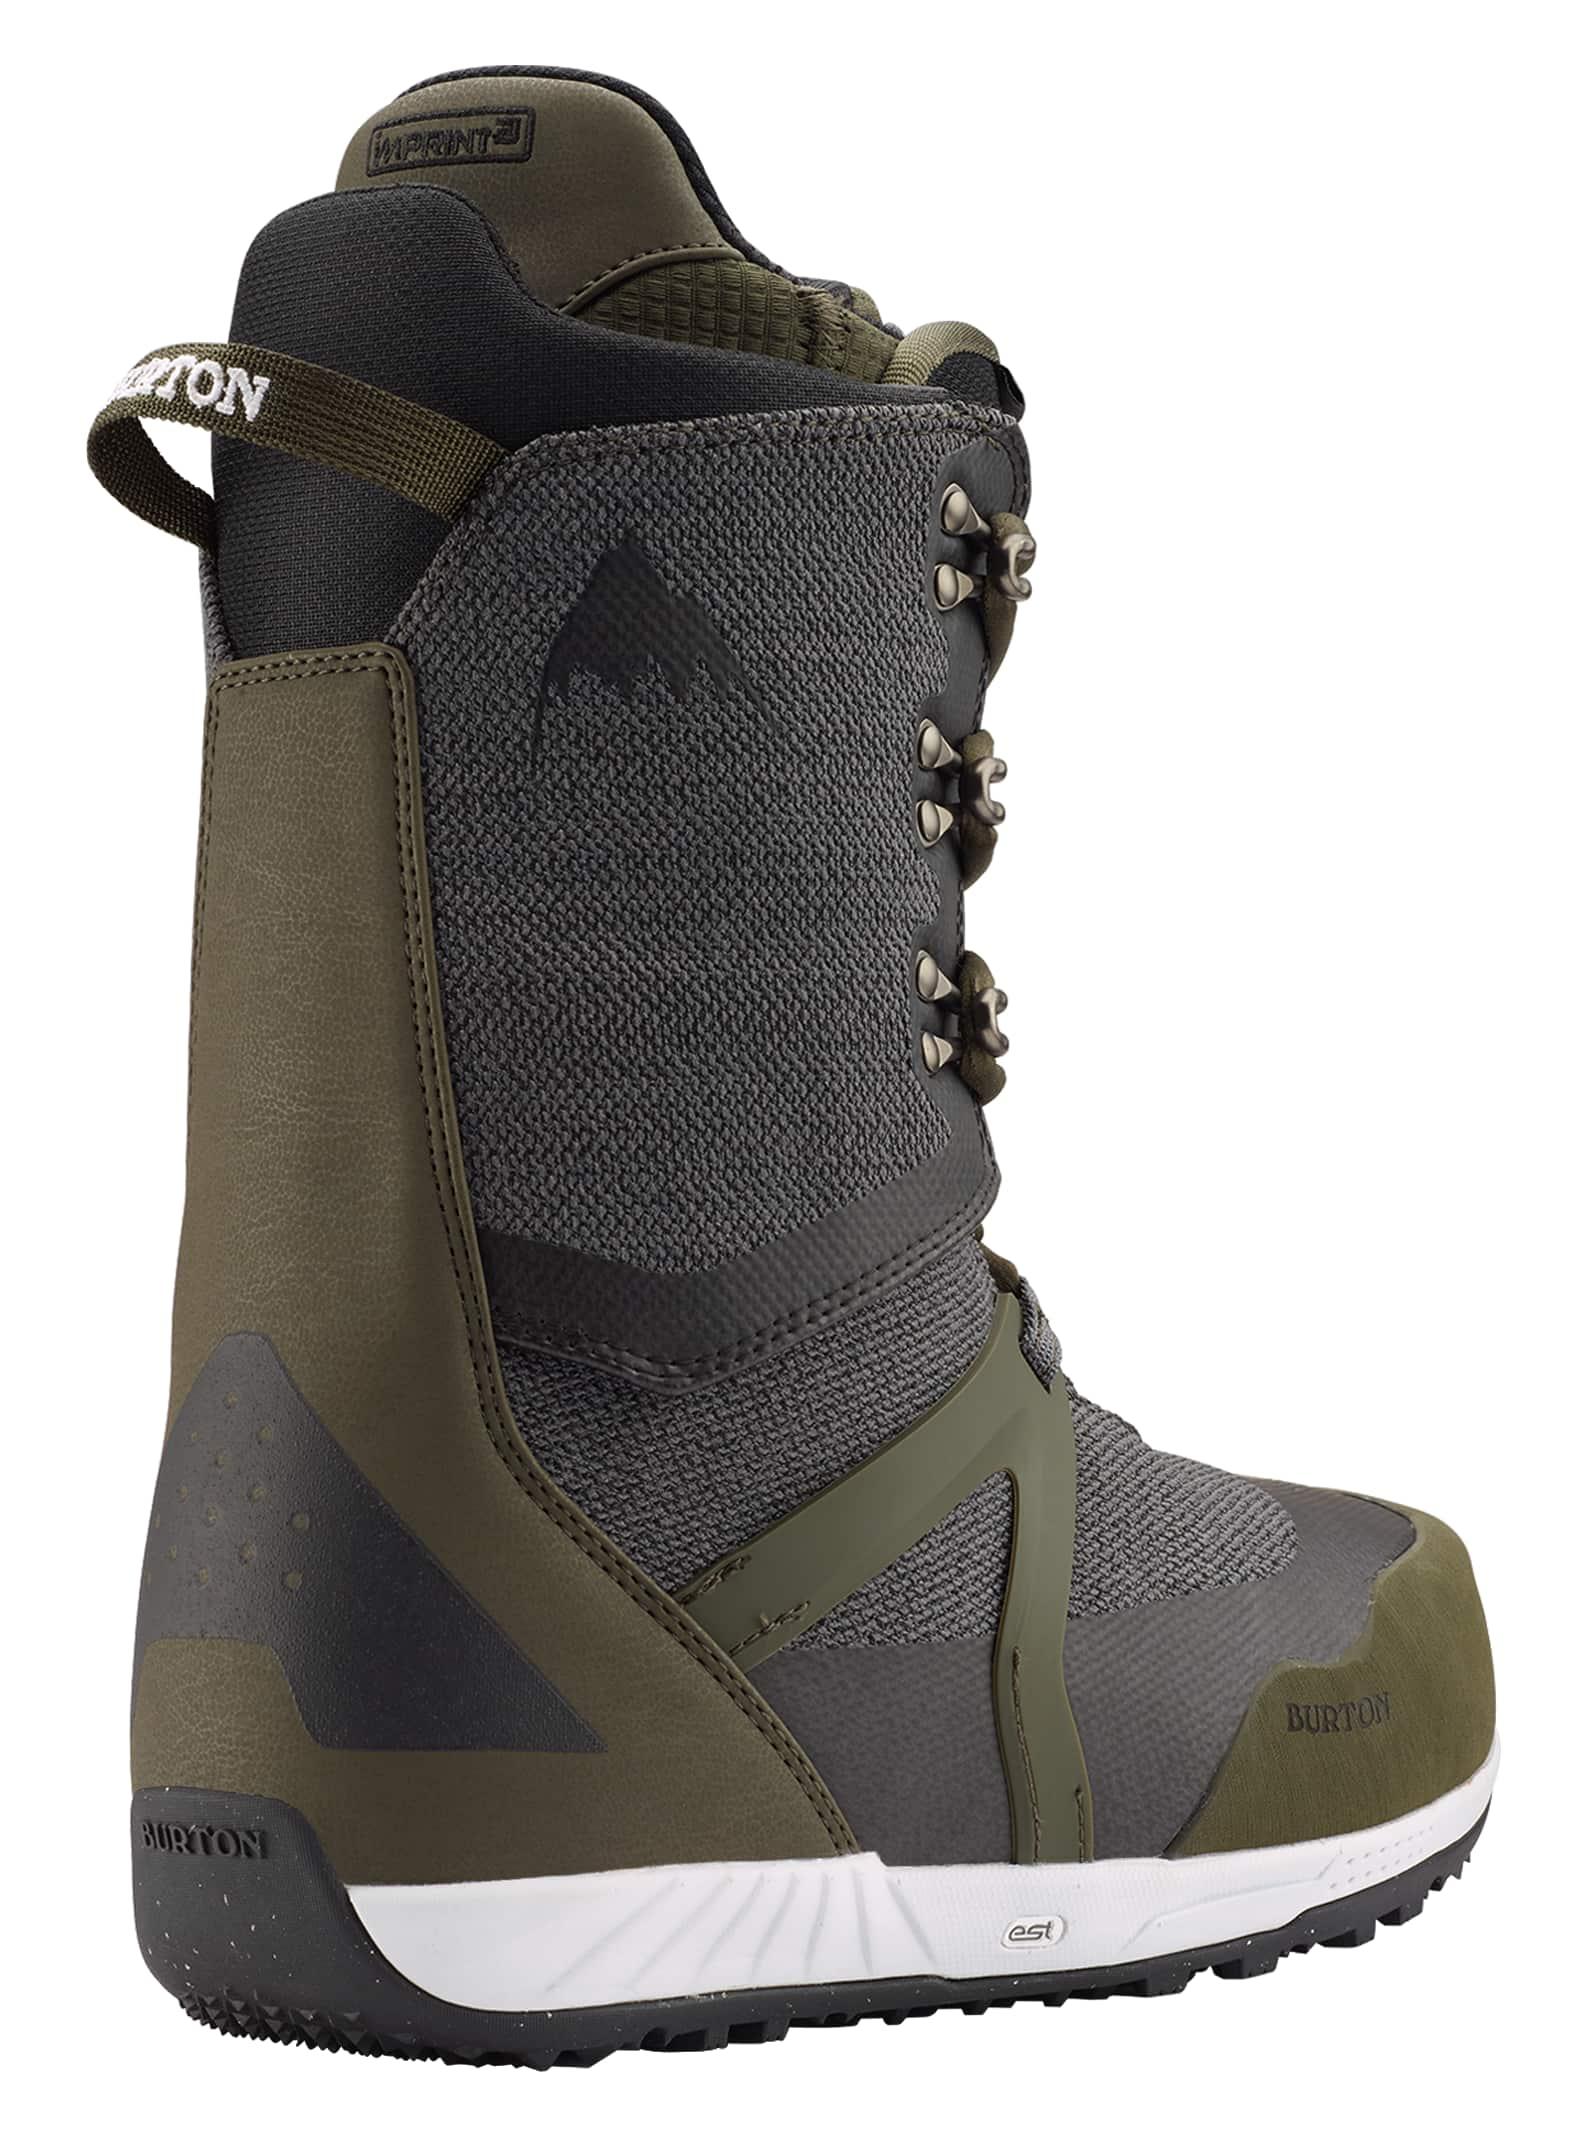 4cc603fd762 Men's Snowboard Boots | Burton Snowboards